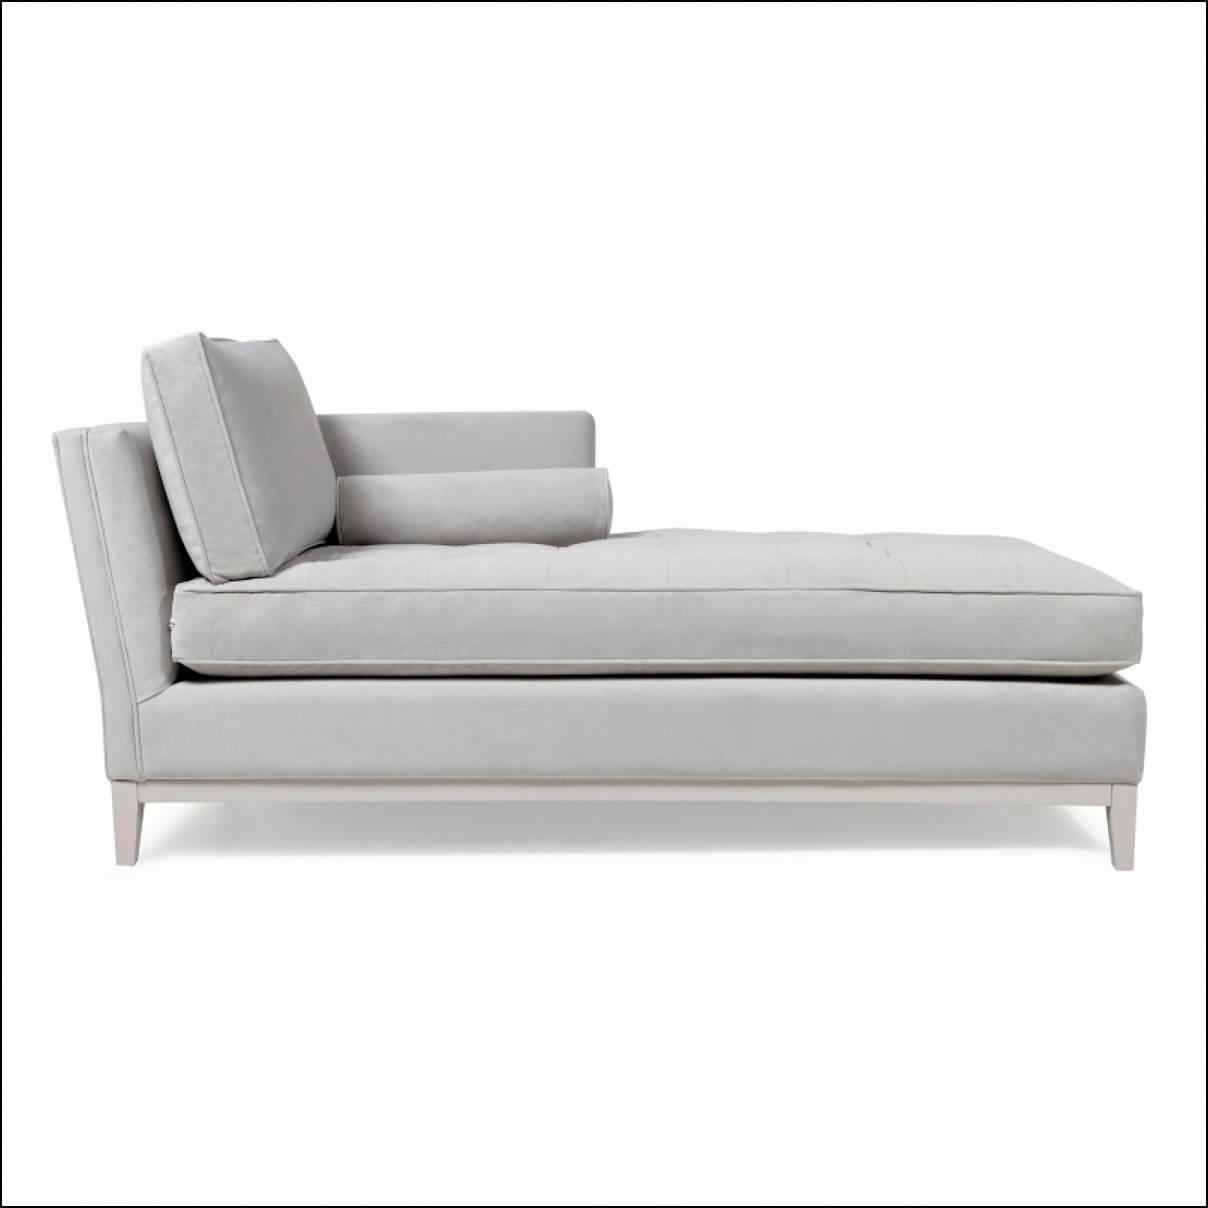 corner sofas on finance business sofa 20 best cheap ideas